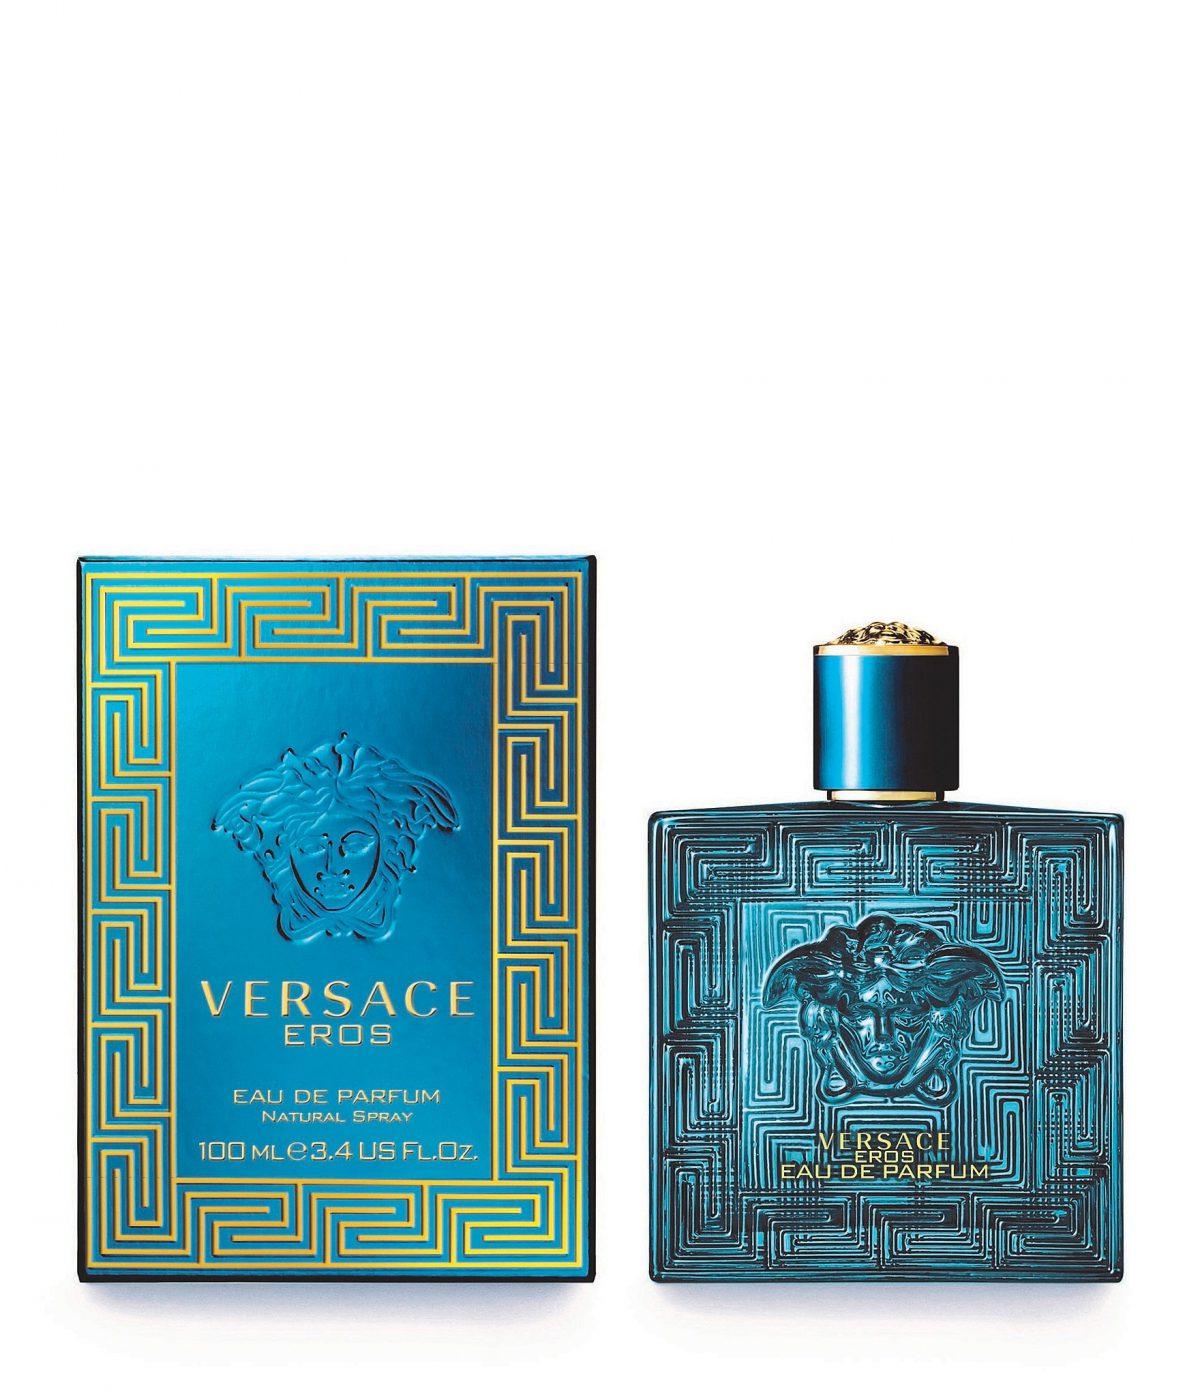 Versace Eros 100ML EDP